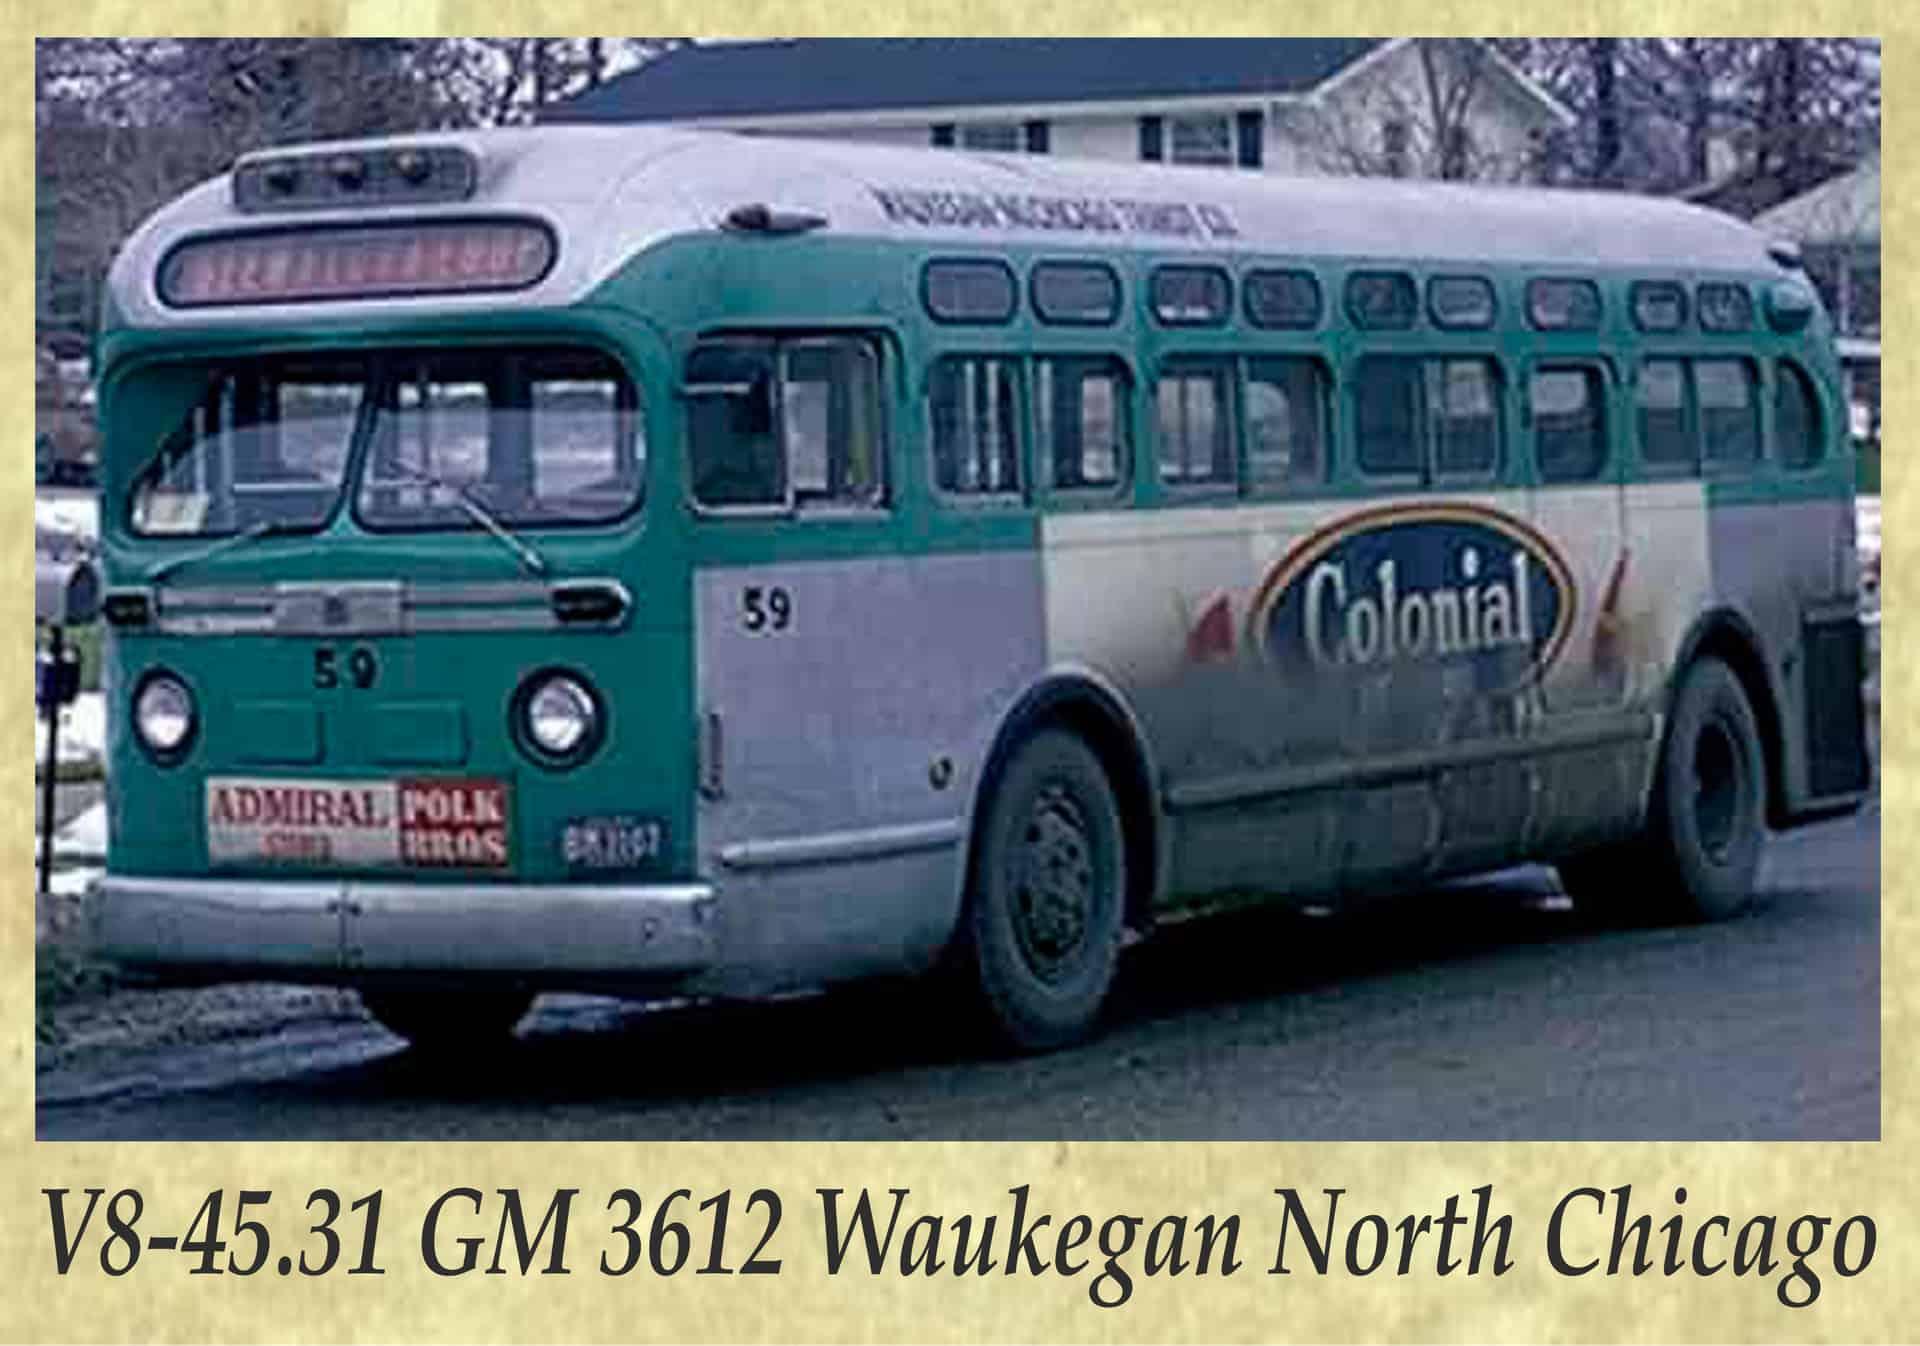 V8-45.31 GM 3612 Waukegan North Chicago